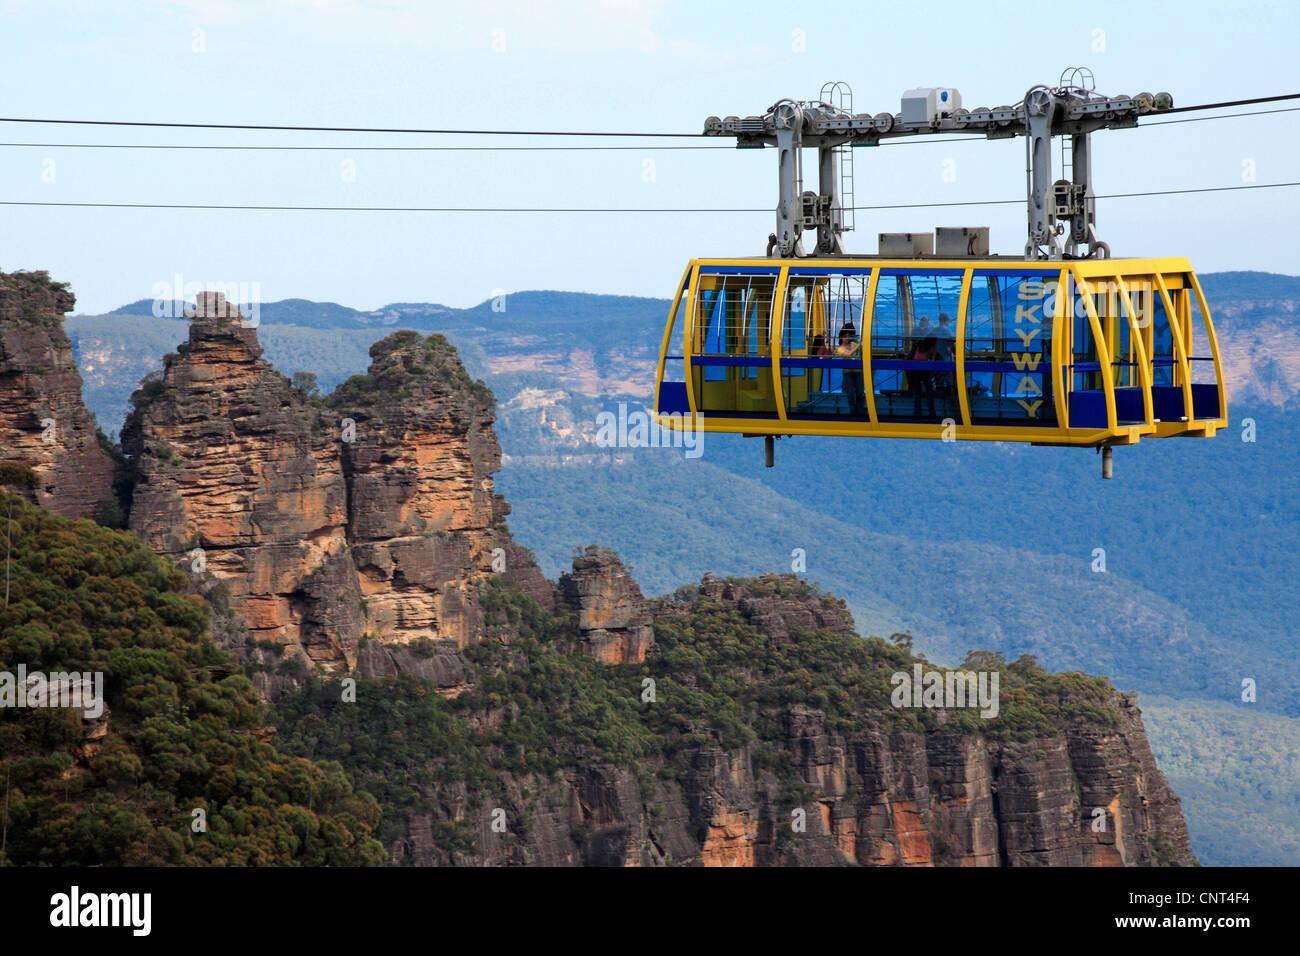 gondola cableway, Australia, New South Wales - Stock Image